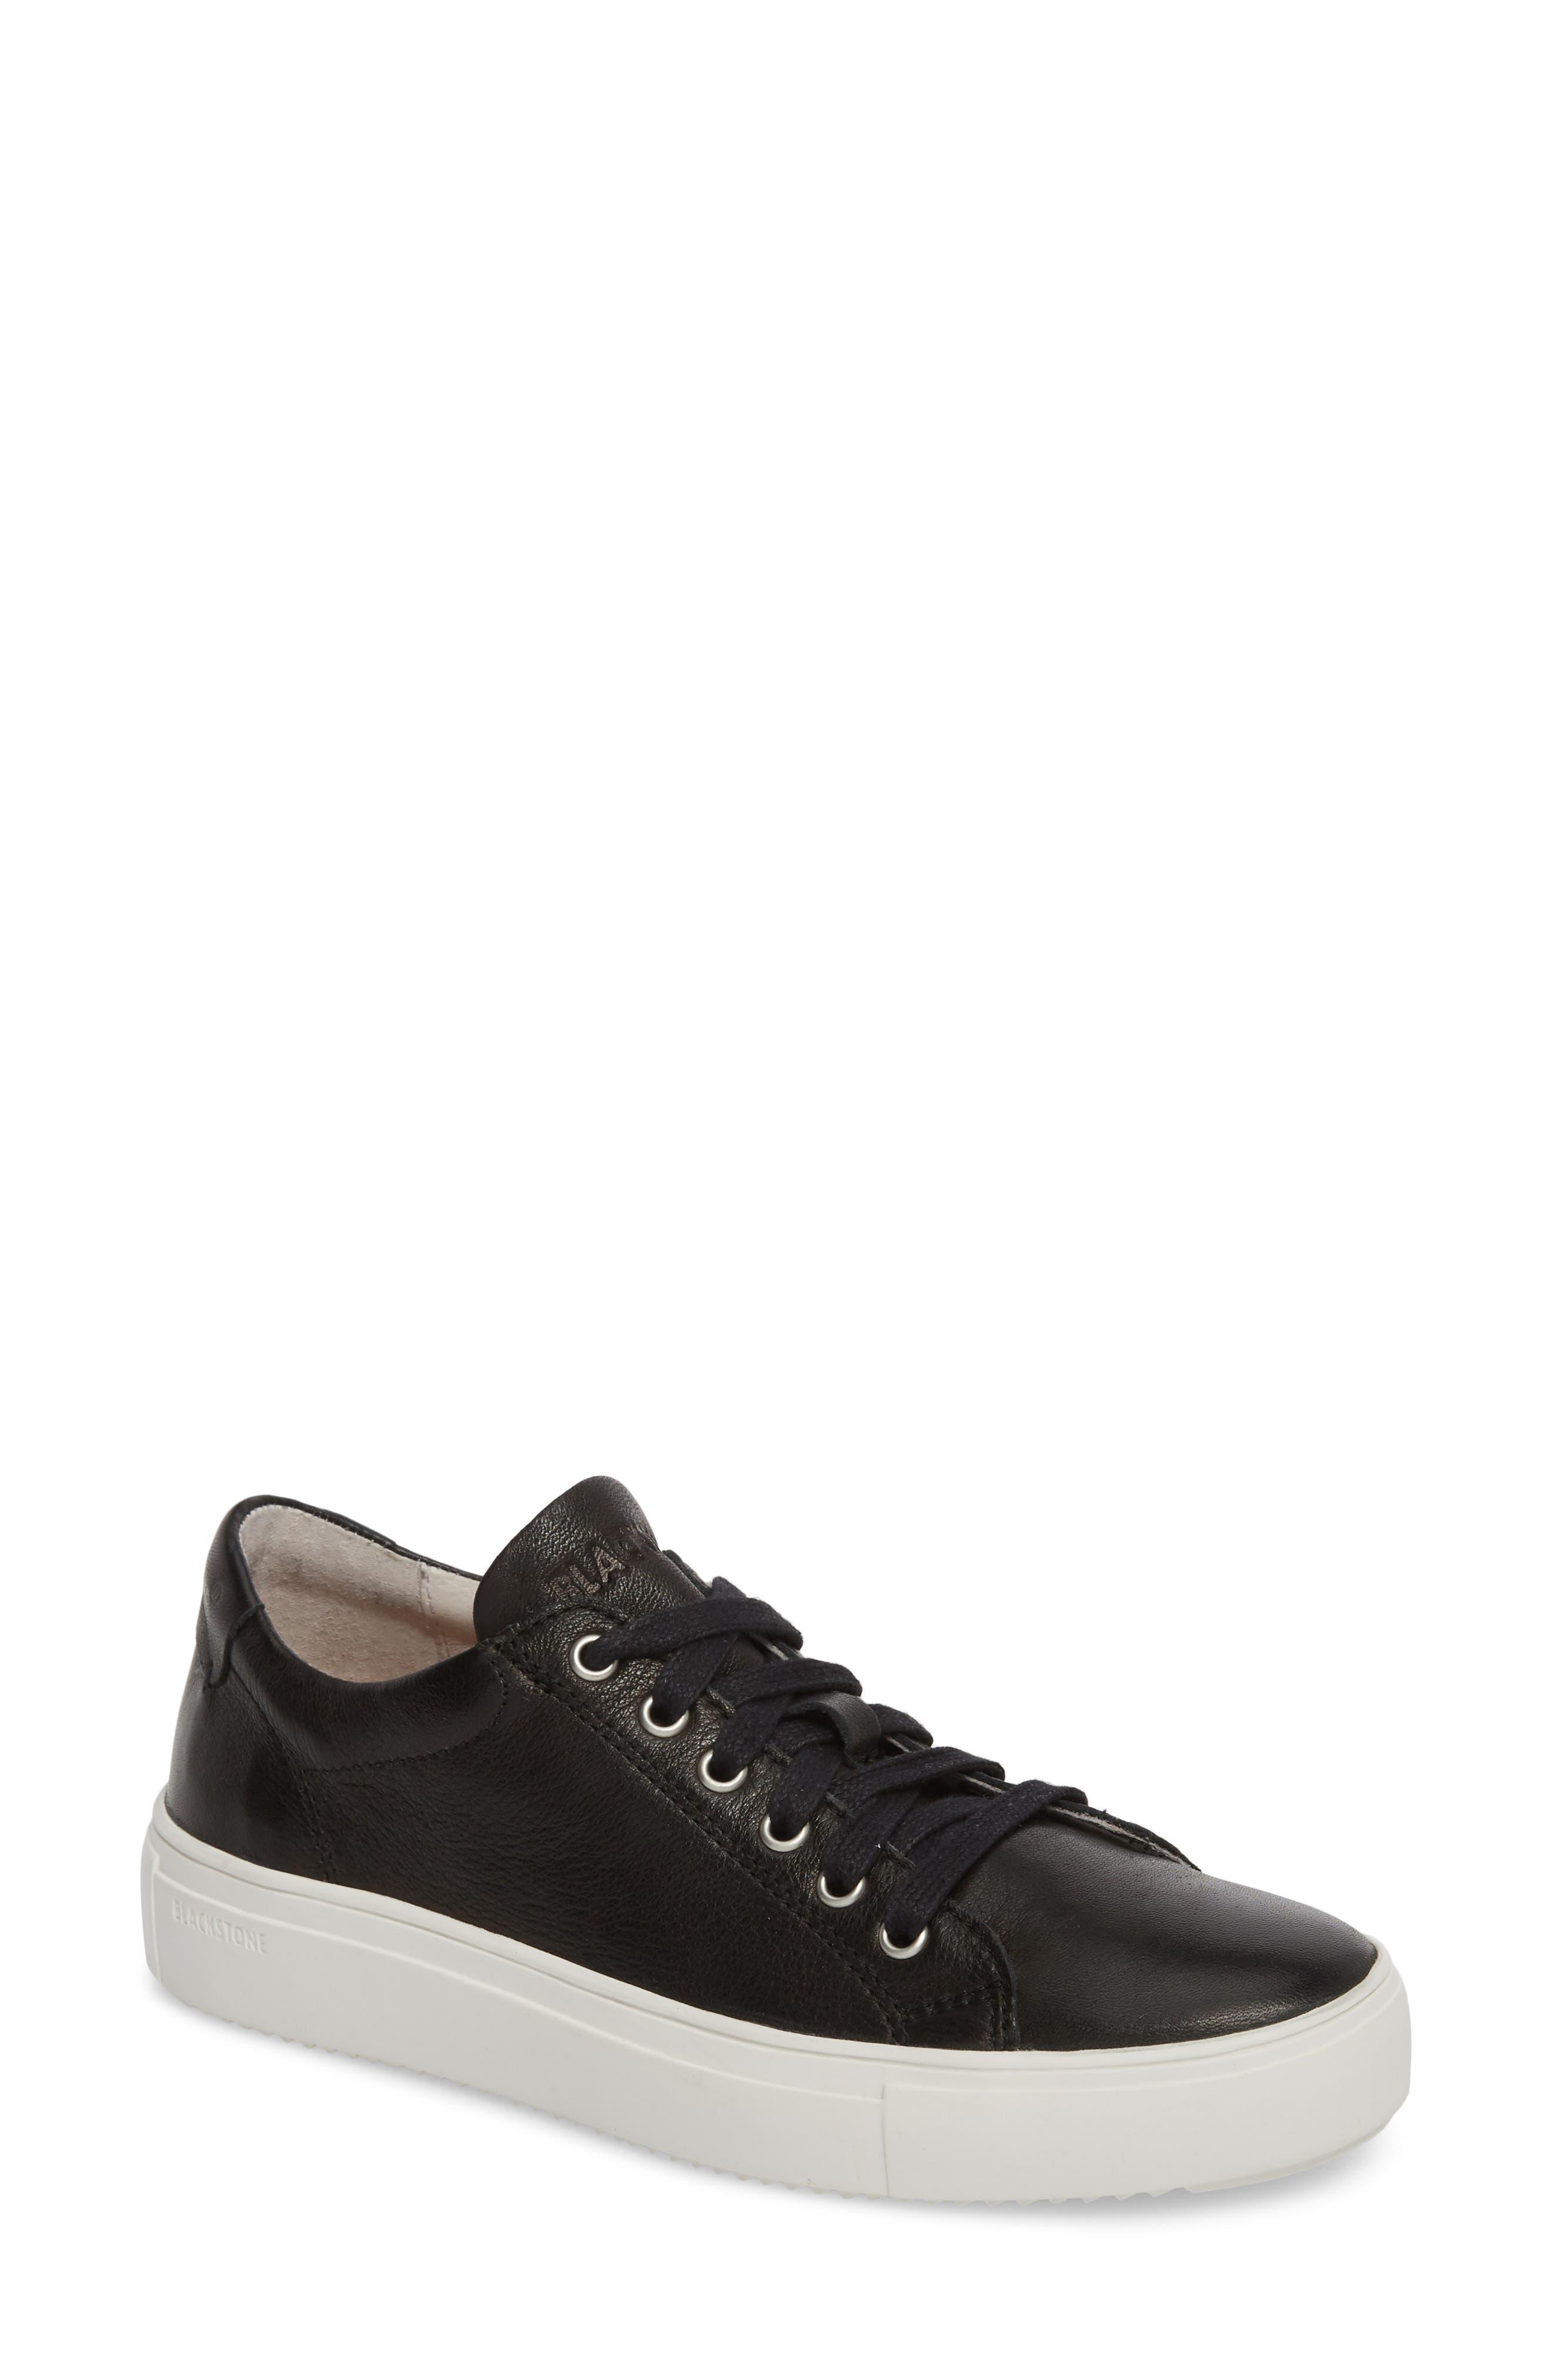 PL71 Low Top Sneaker,                         Main,                         color, BLACK LEATHER